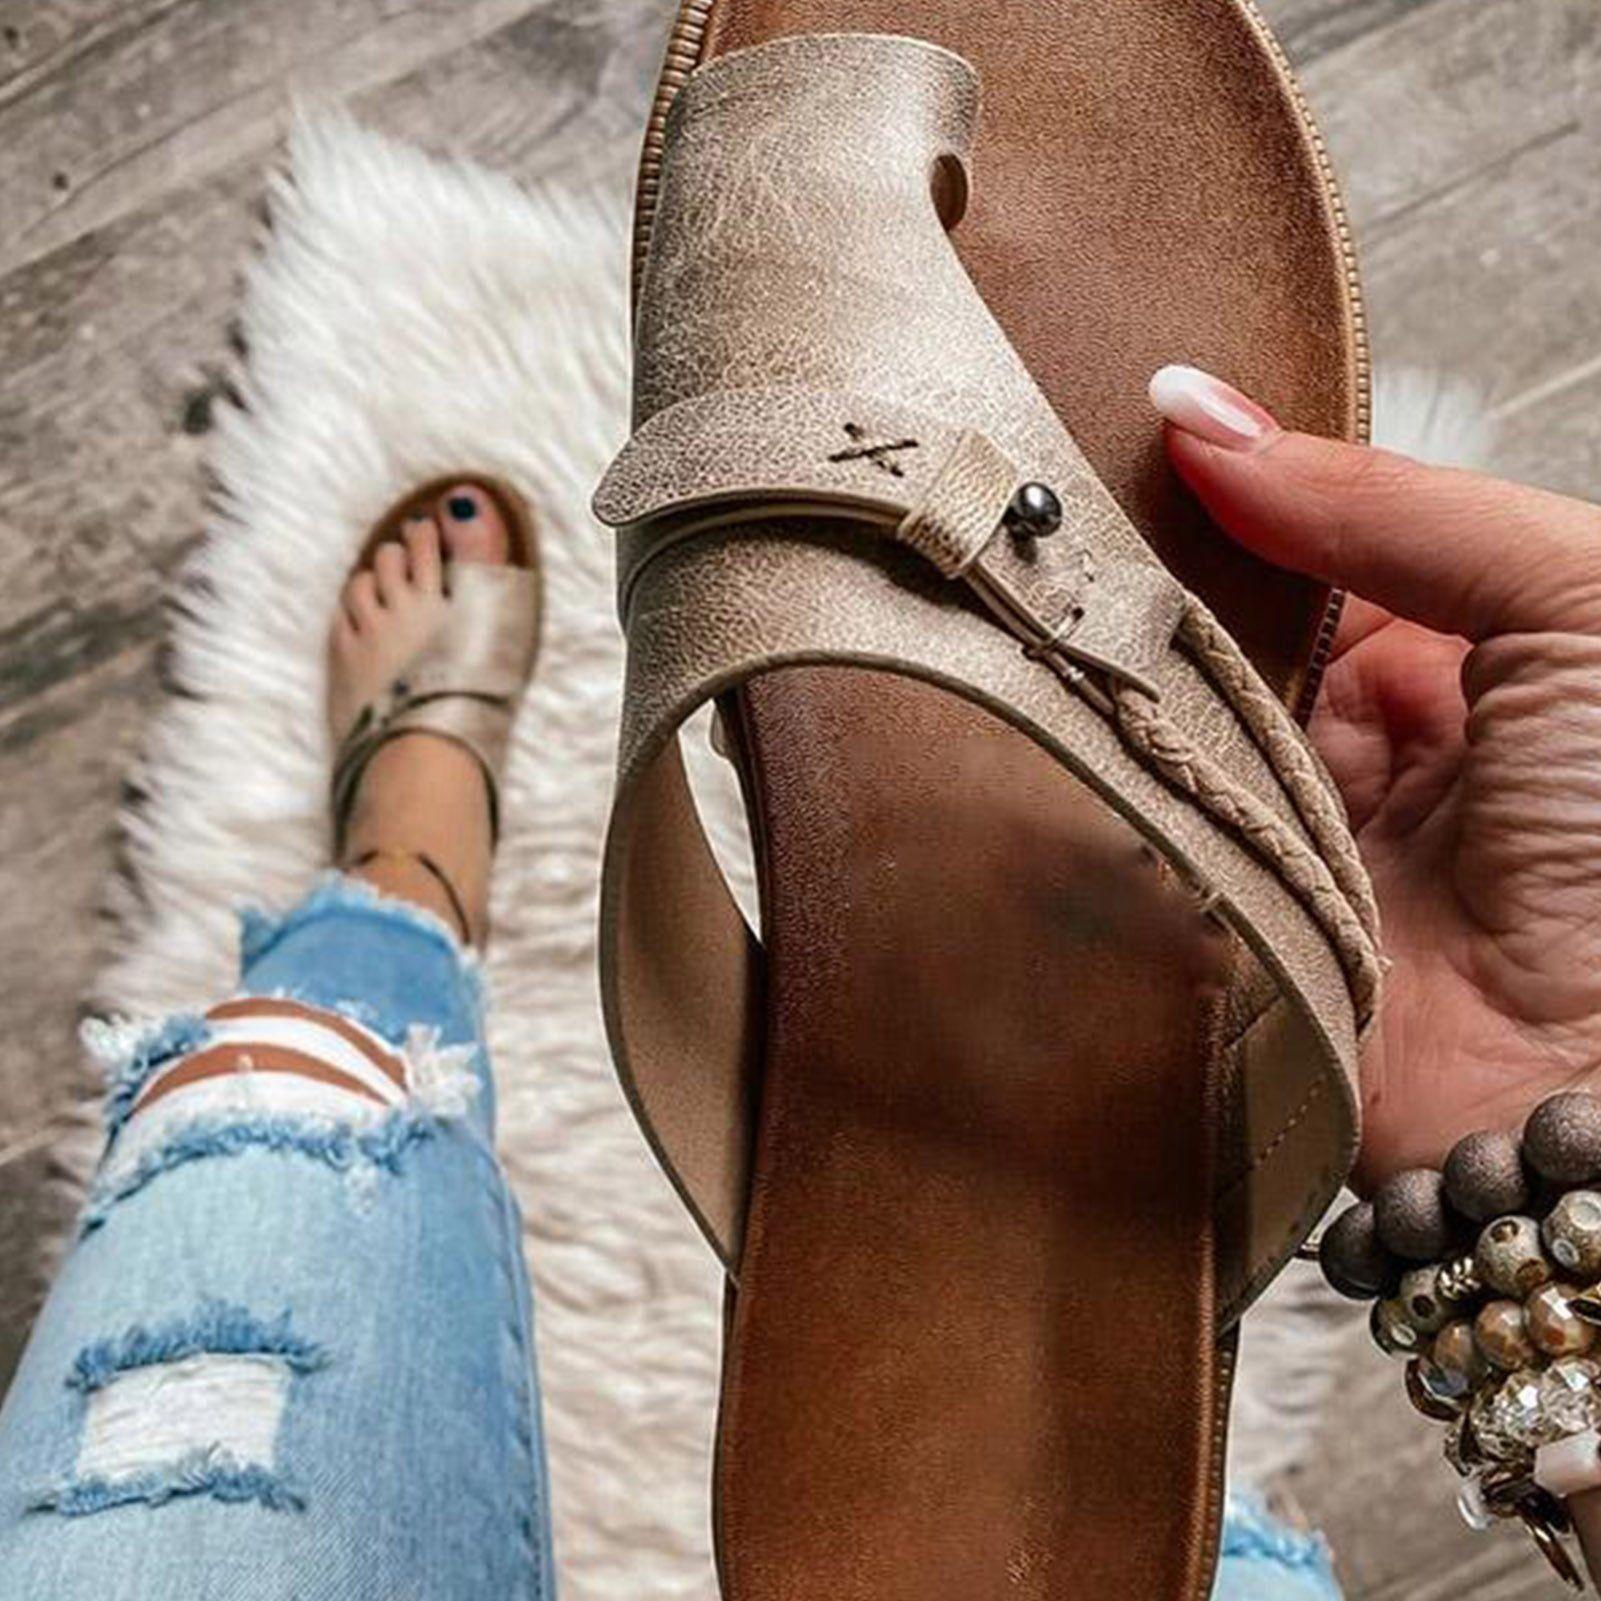 Open-Toe Summer Sandals New 2021 Flat Bottom Fashion Women Slides Big Size Slip on Sandals Woman Outside Beach Flat Designer - Khaki / 40